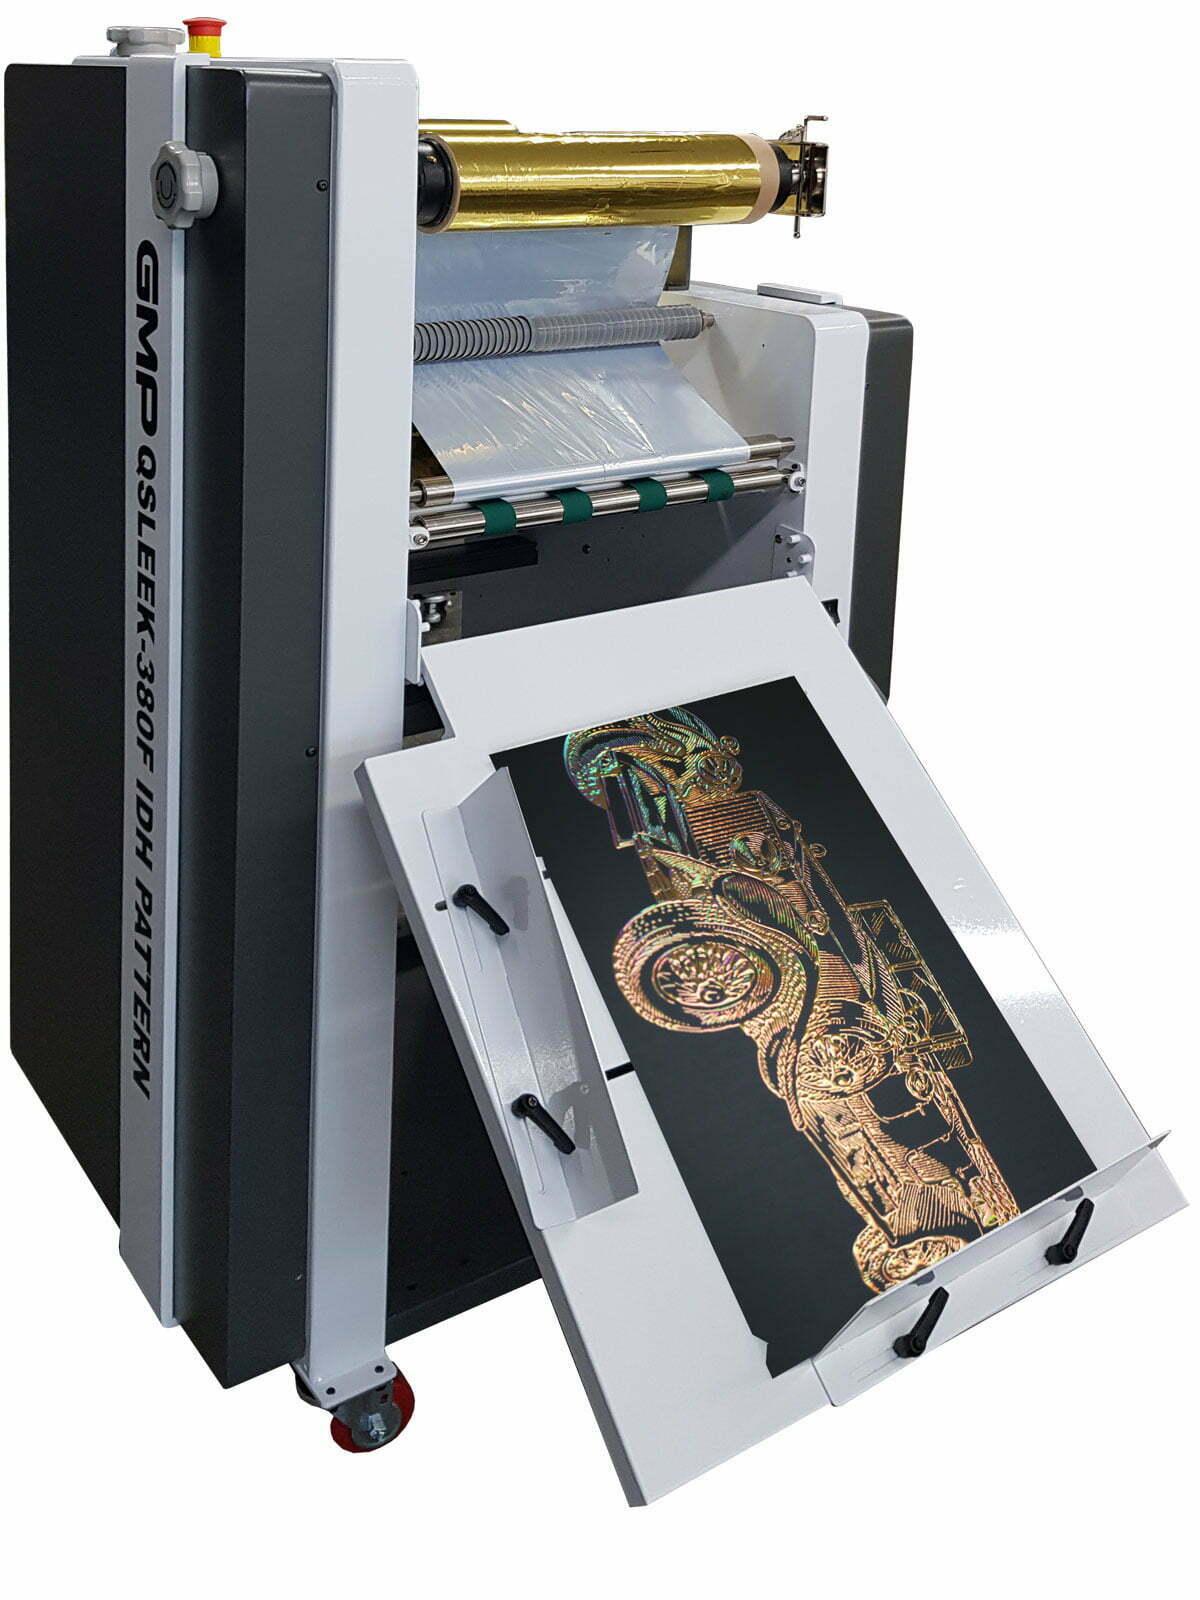 header-img-product-gmp-qsleek-380-idh-voegt-3d-folie-toe-aan-duplo-dusense-spot-uv-coating